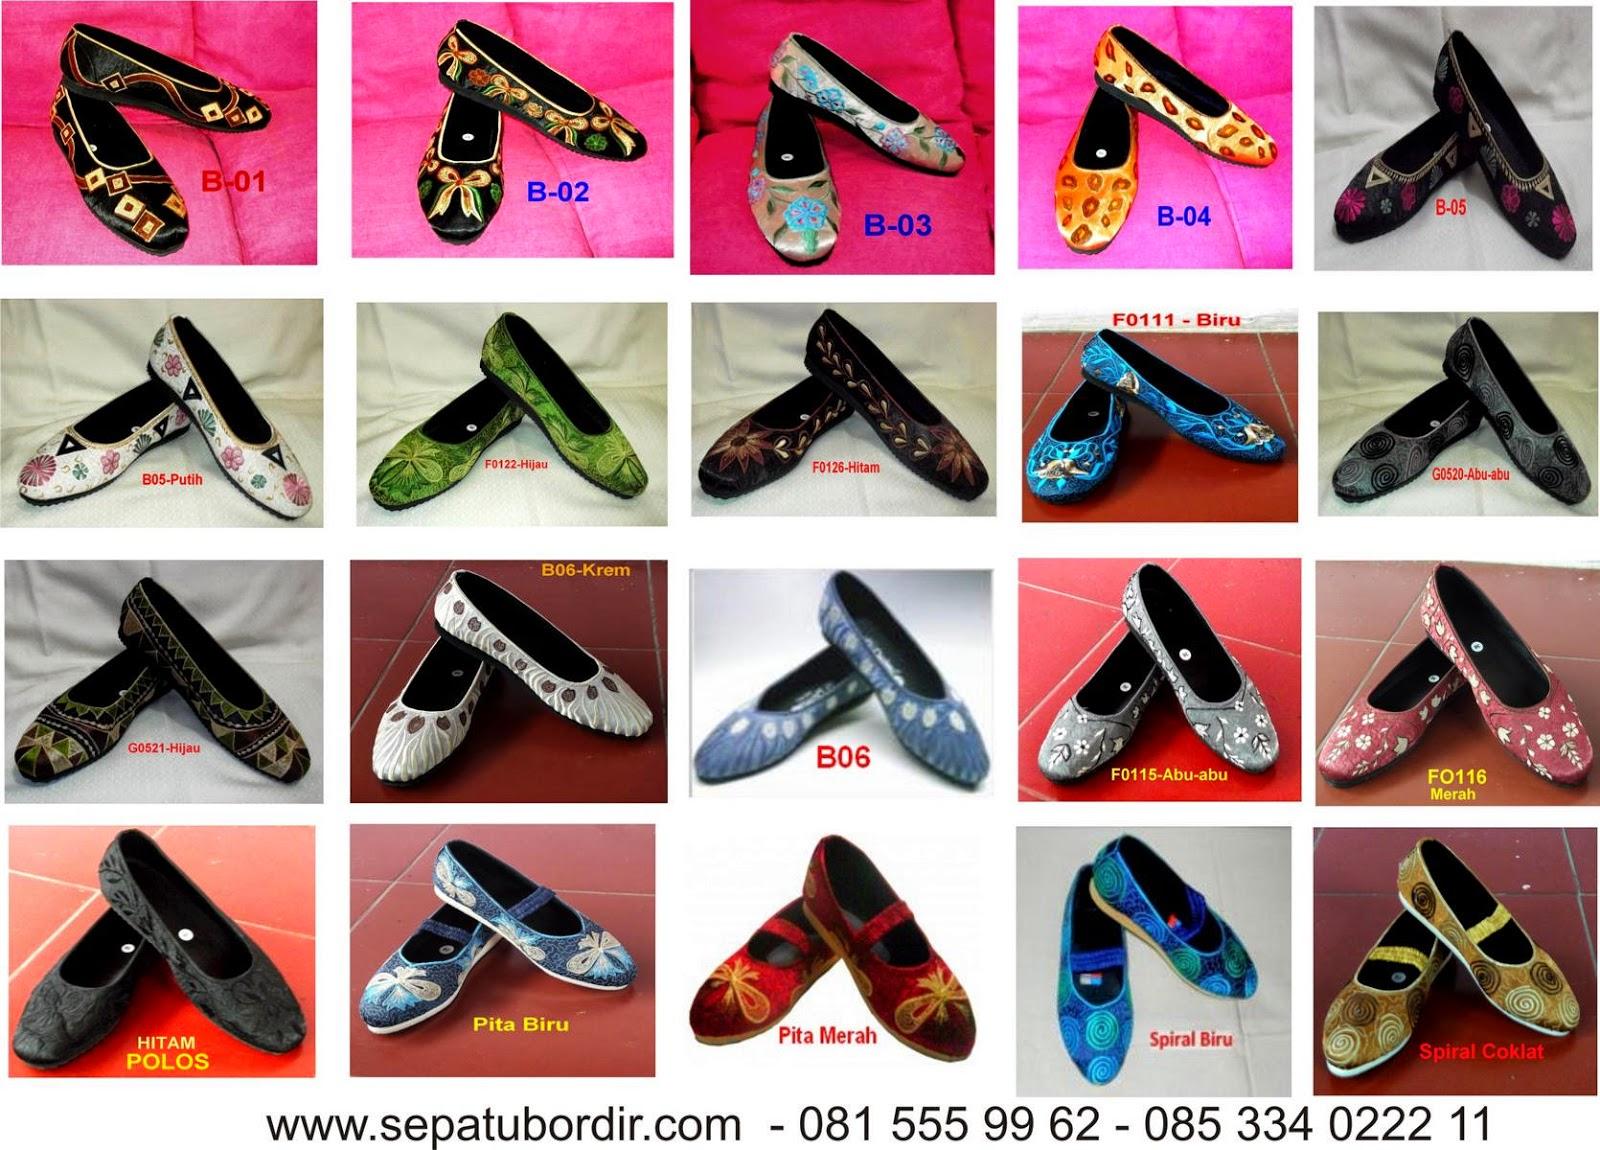 sepatu bordir tokopedia, sepatu bordir terbaru, sepatu bordir tasik, model sepatu bordir terbaru,  sepatu bordir untuk mesin jahit, sepatu jahit untuk bordir, ukuran sepatu bordir, sepatu bordir wedges,  model sepatu bordir wanita, sepatu bordir Yogyakarta, grosir sepatu bordir Yogyakarta, yanti sepatu bordir, sepatu bordir 2018, sepatu bordir 2019,